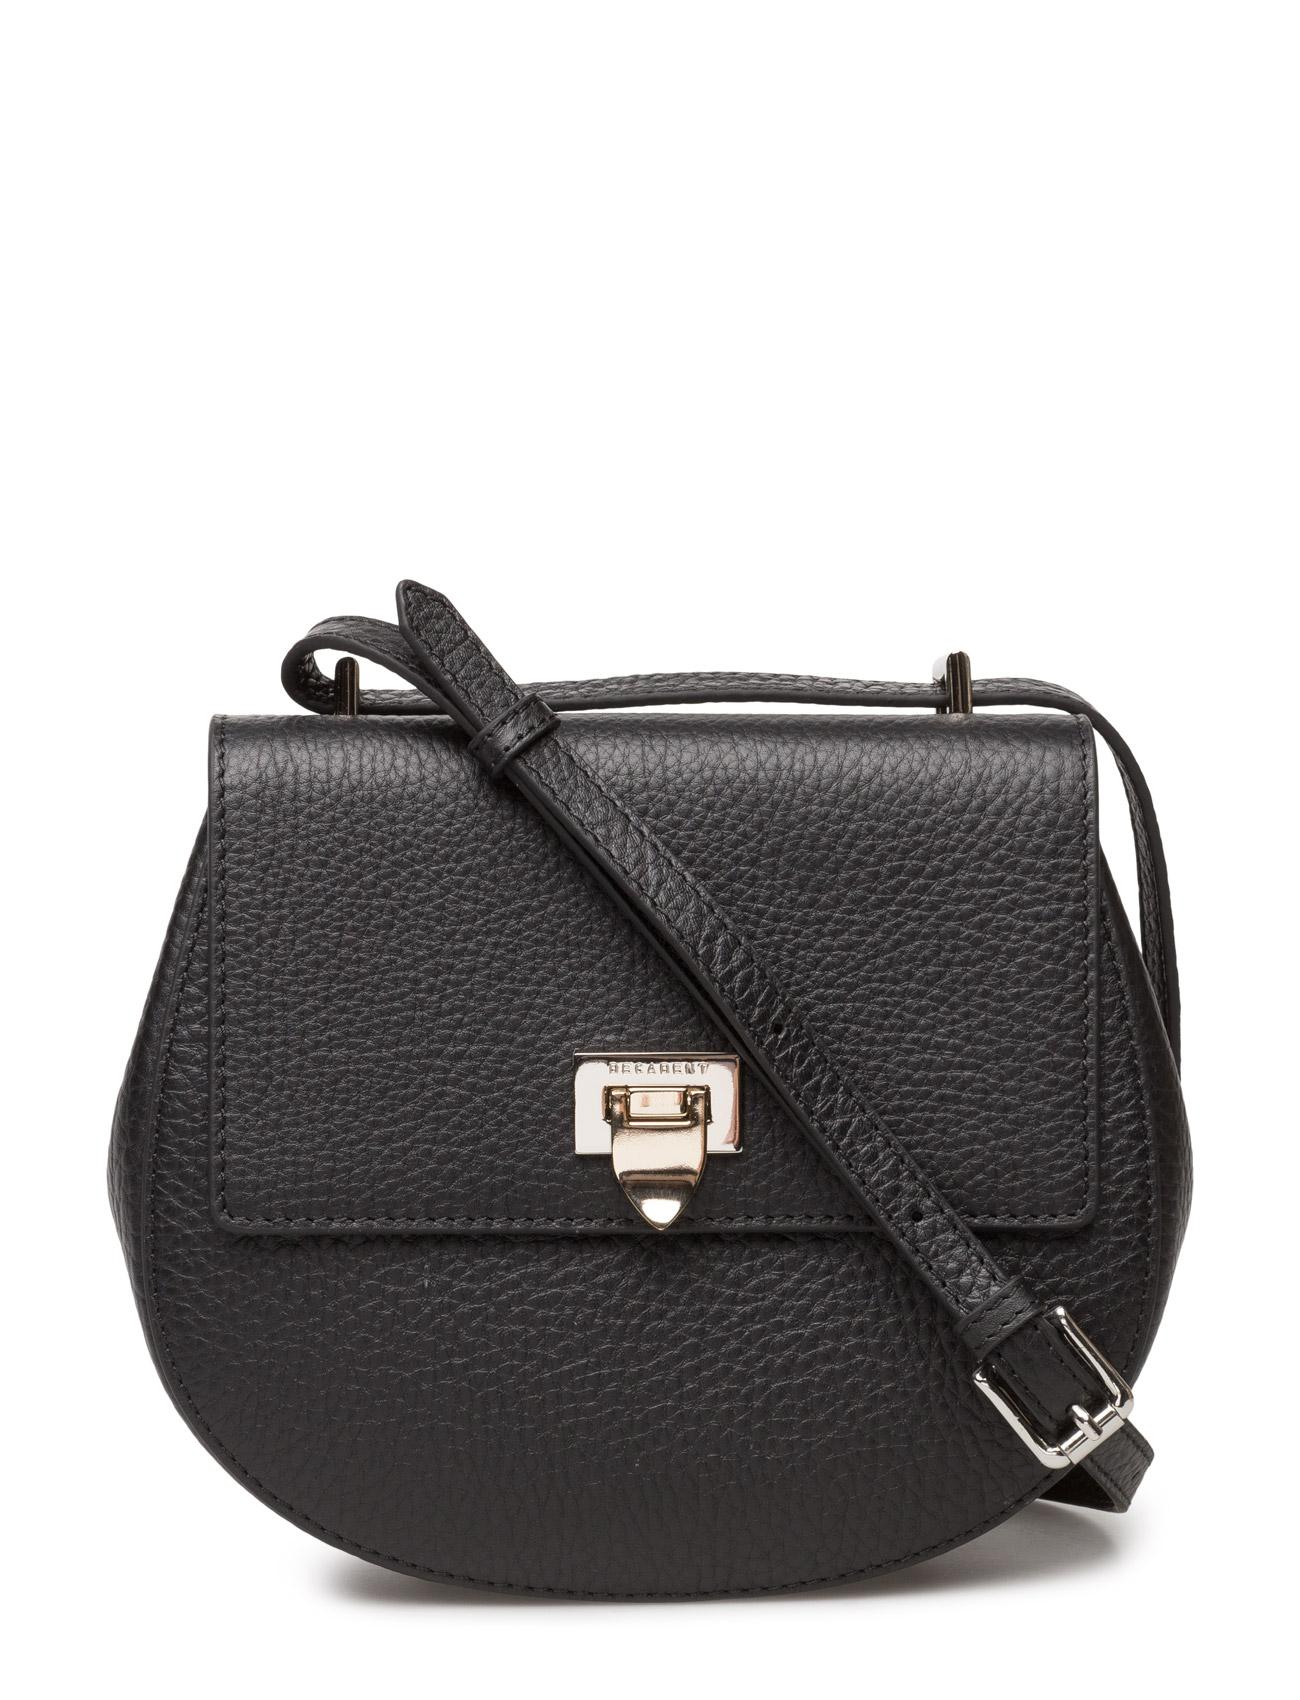 Tiny round satchel bag w/buckle fra decadent på boozt.com dk